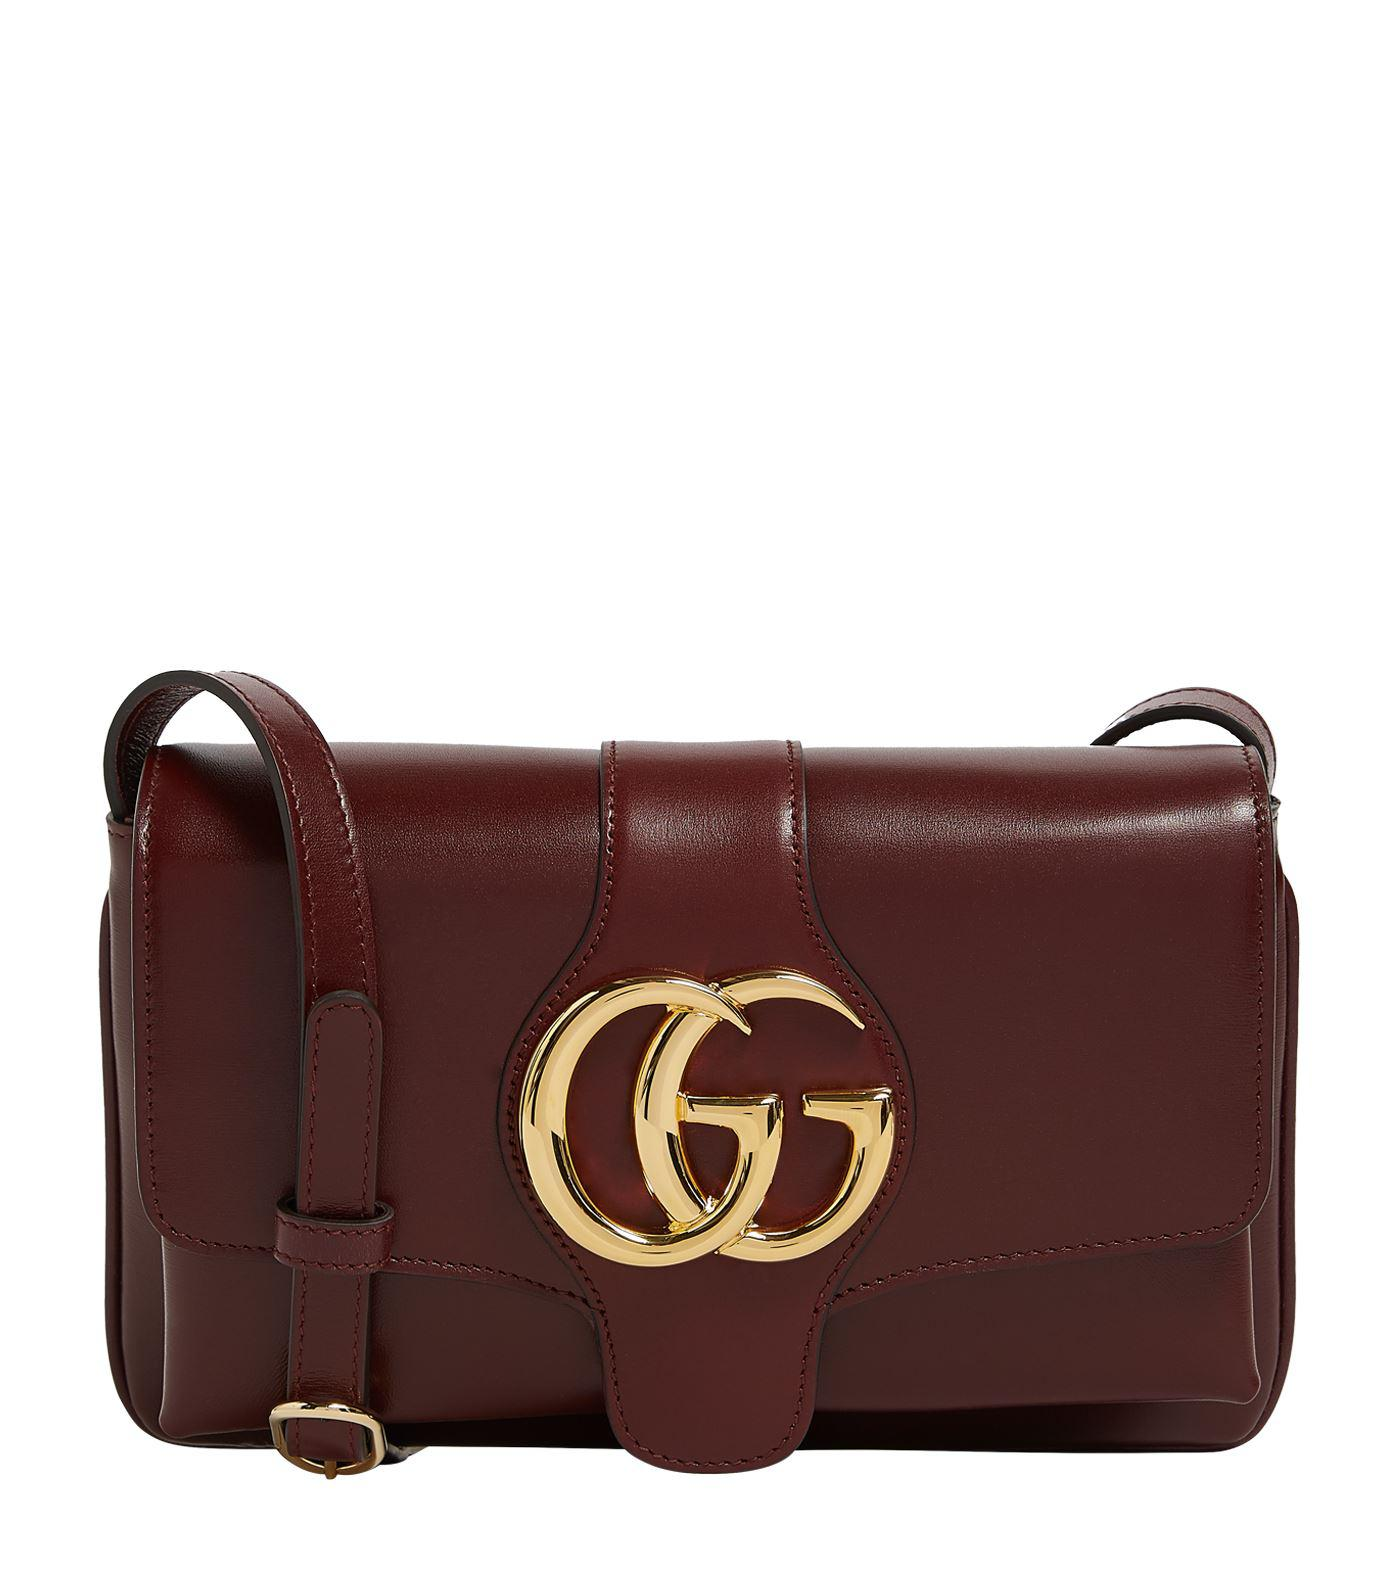 Gucci Arli Shoulder Bag in Brown - Lyst fc75ad4e6fd78